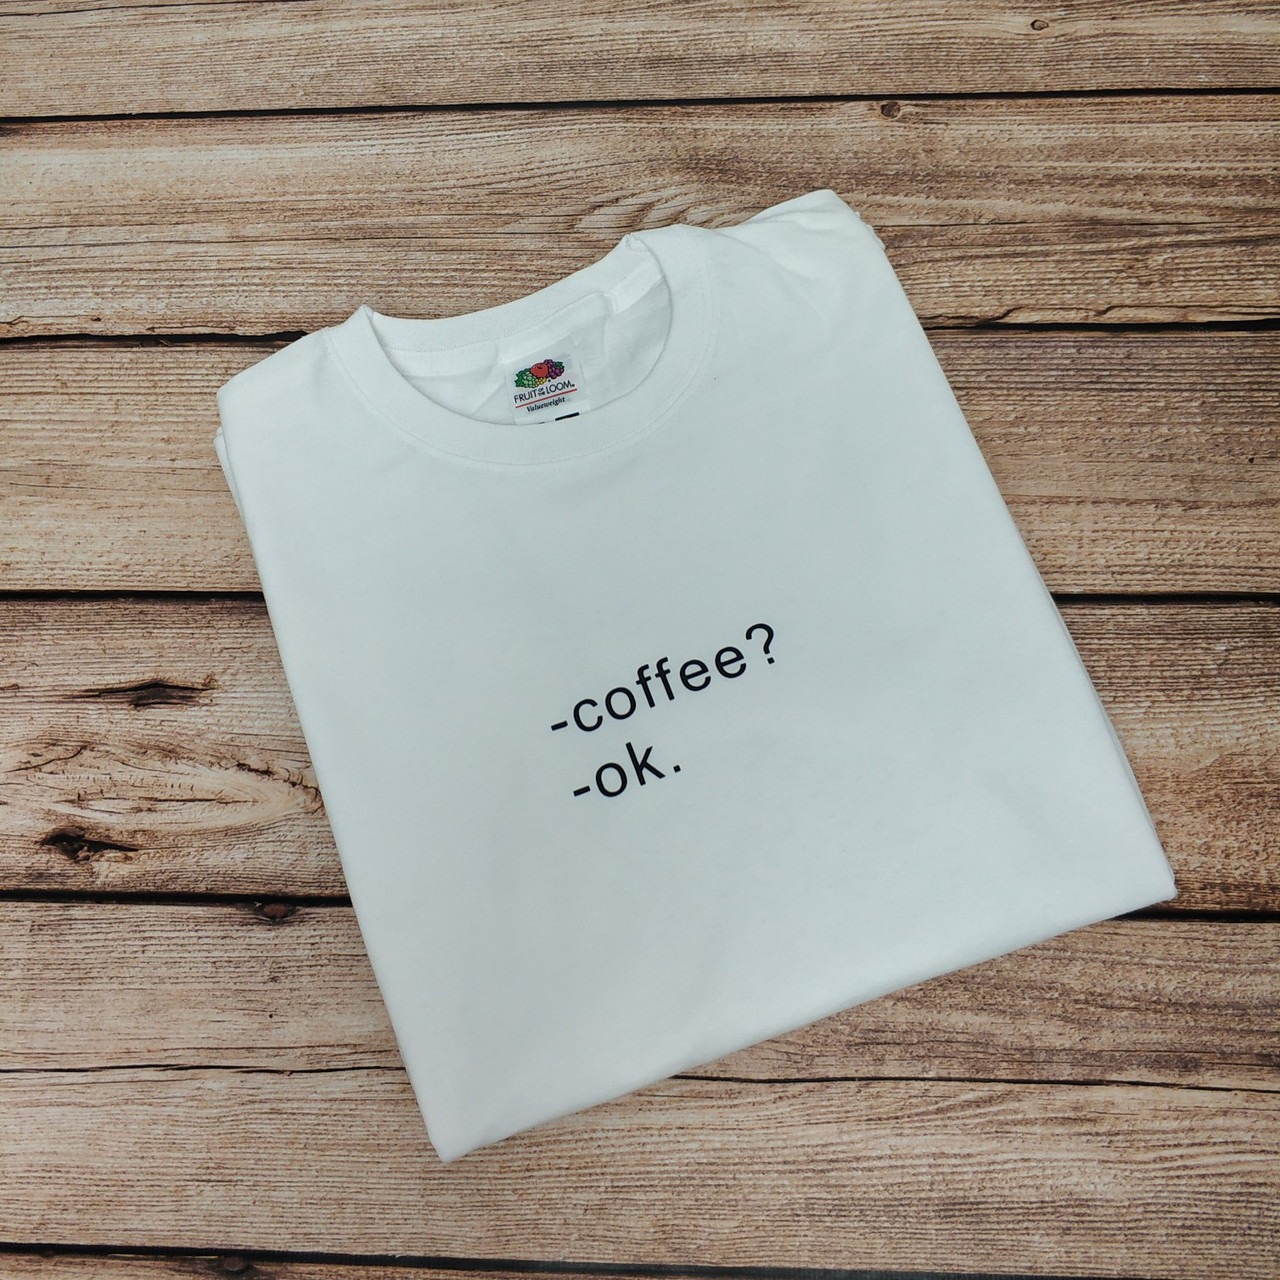 Футболка женская кофе coffee ok